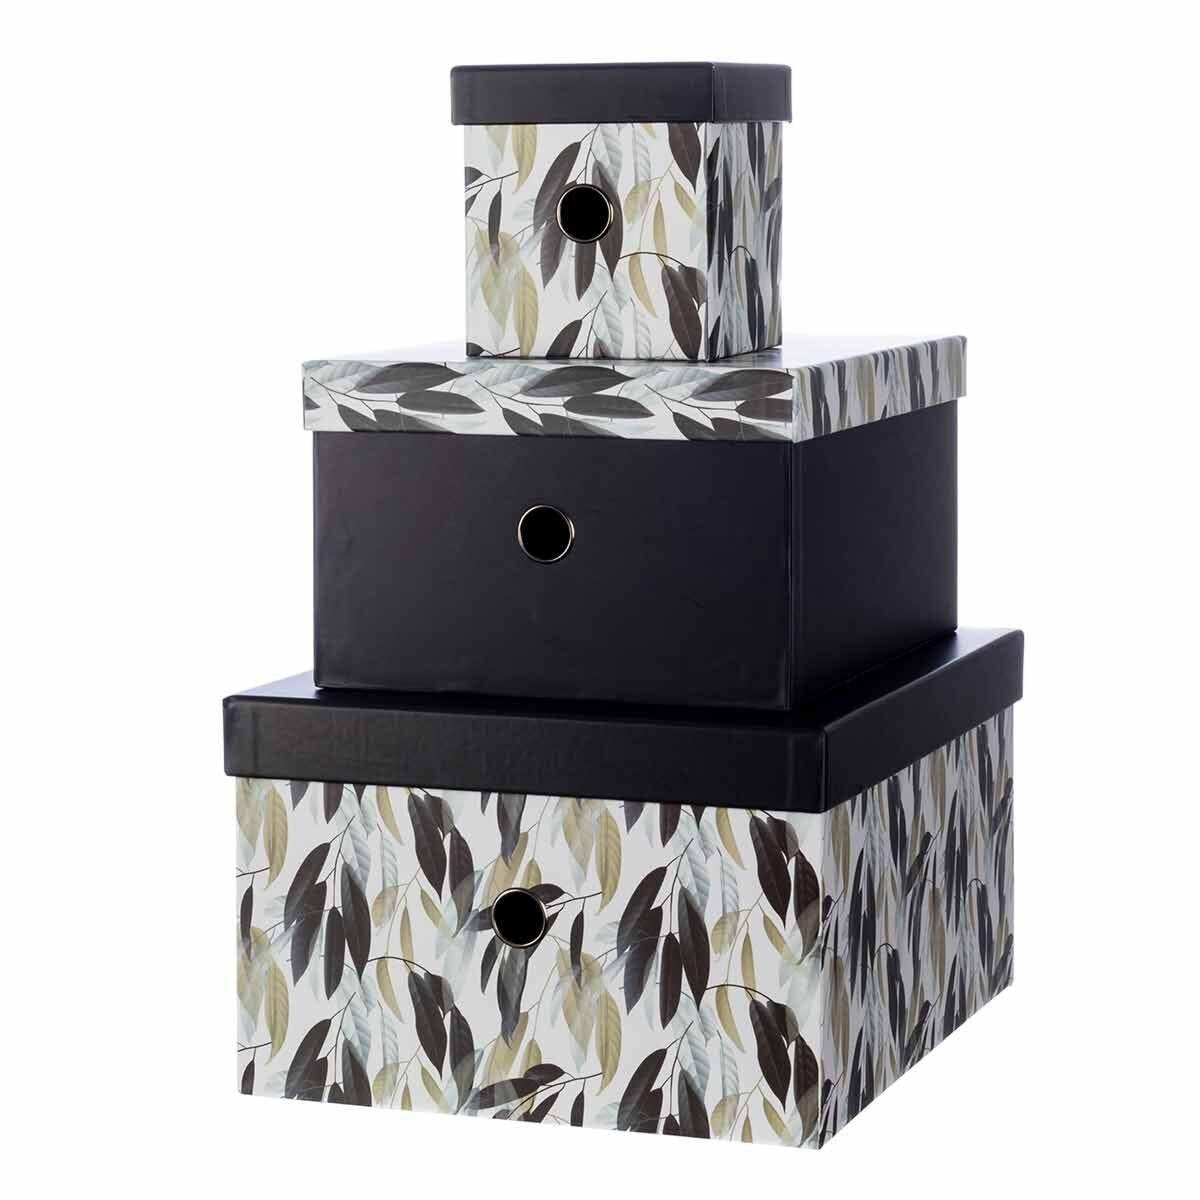 Ryman Storage Boxes Floral Design Set of 3